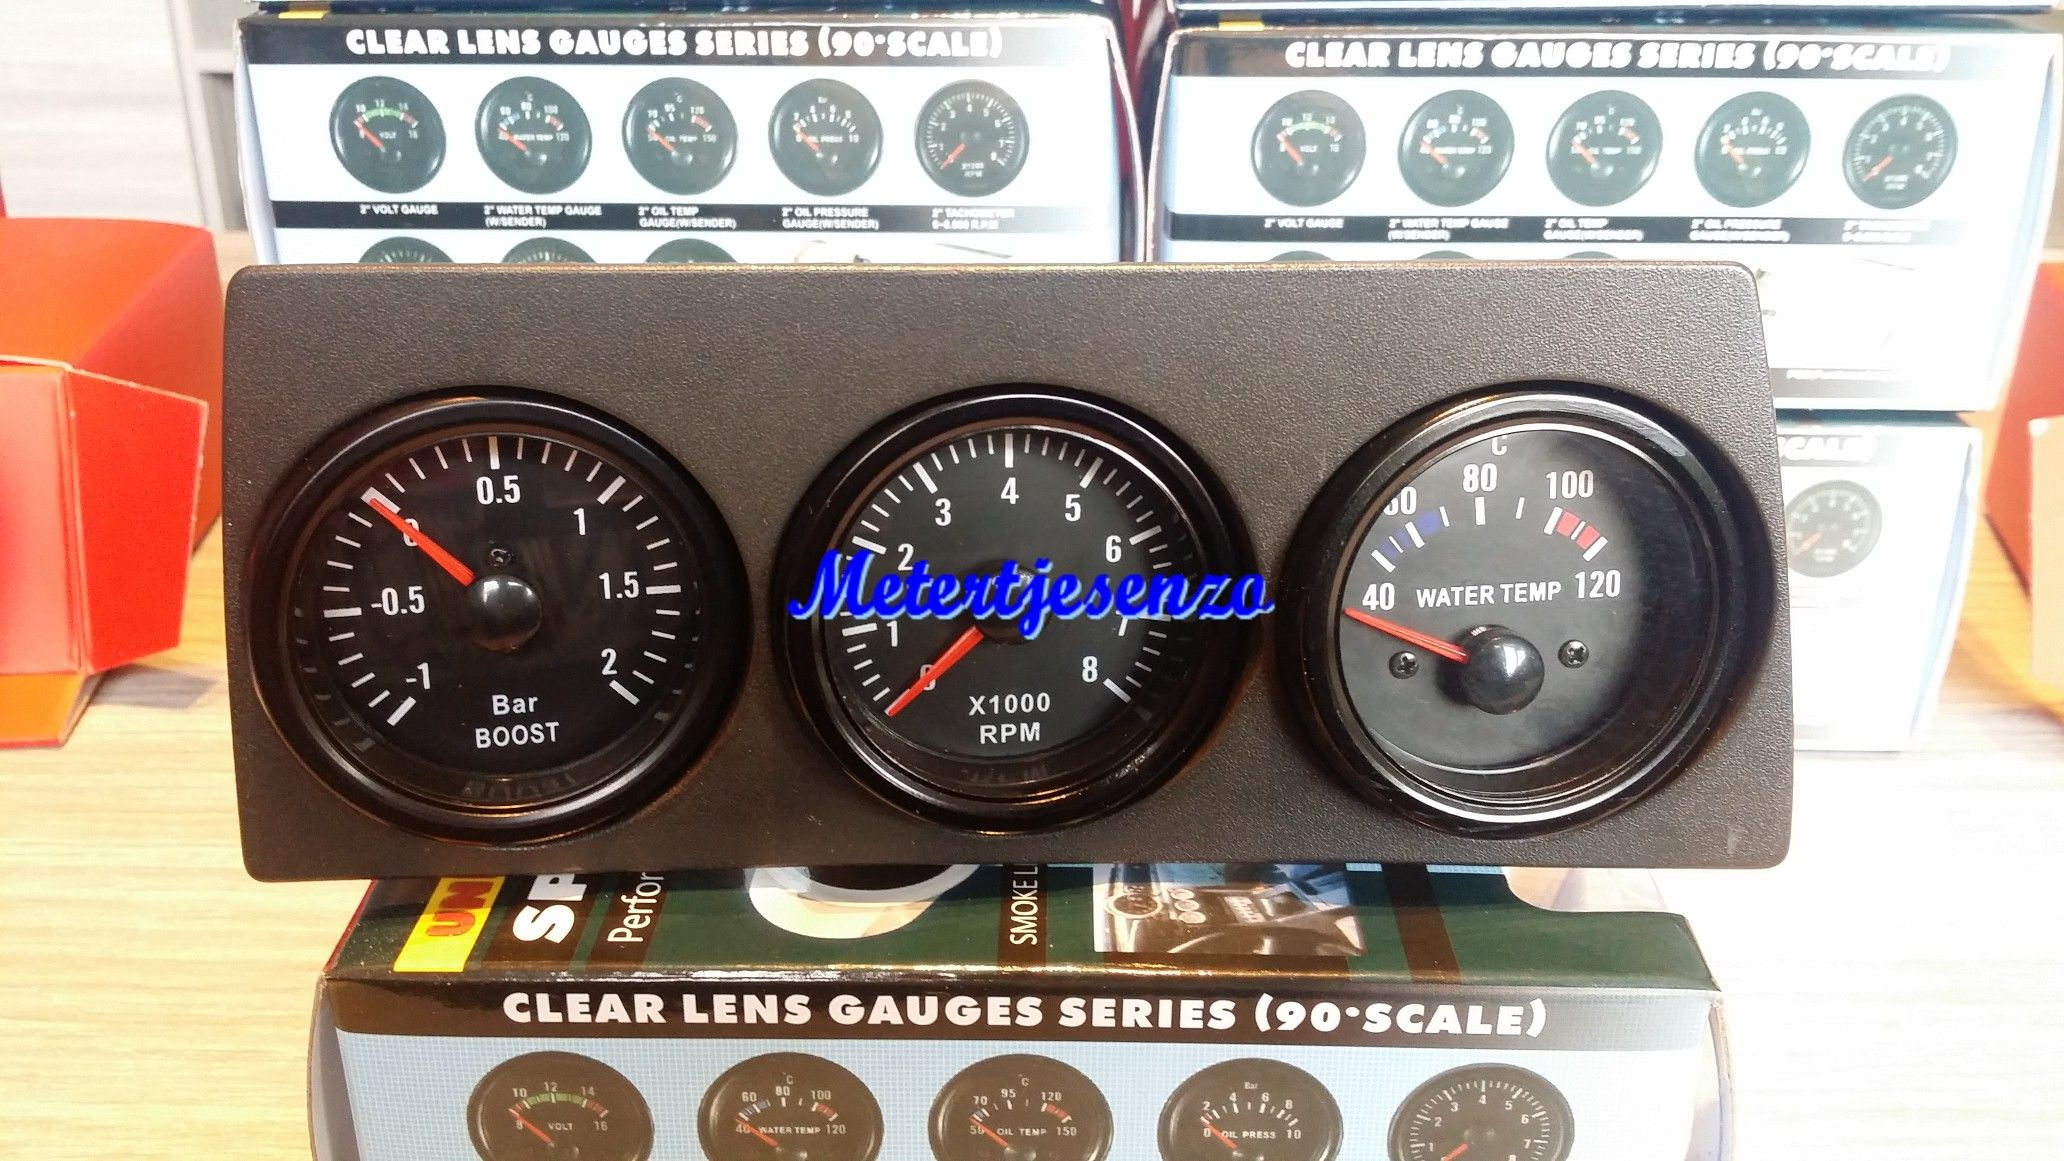 d58d4facf2465d70bce7fab1ddf28874 Surprising Tvr Griffith Oil Pressure Sender Cars Trend